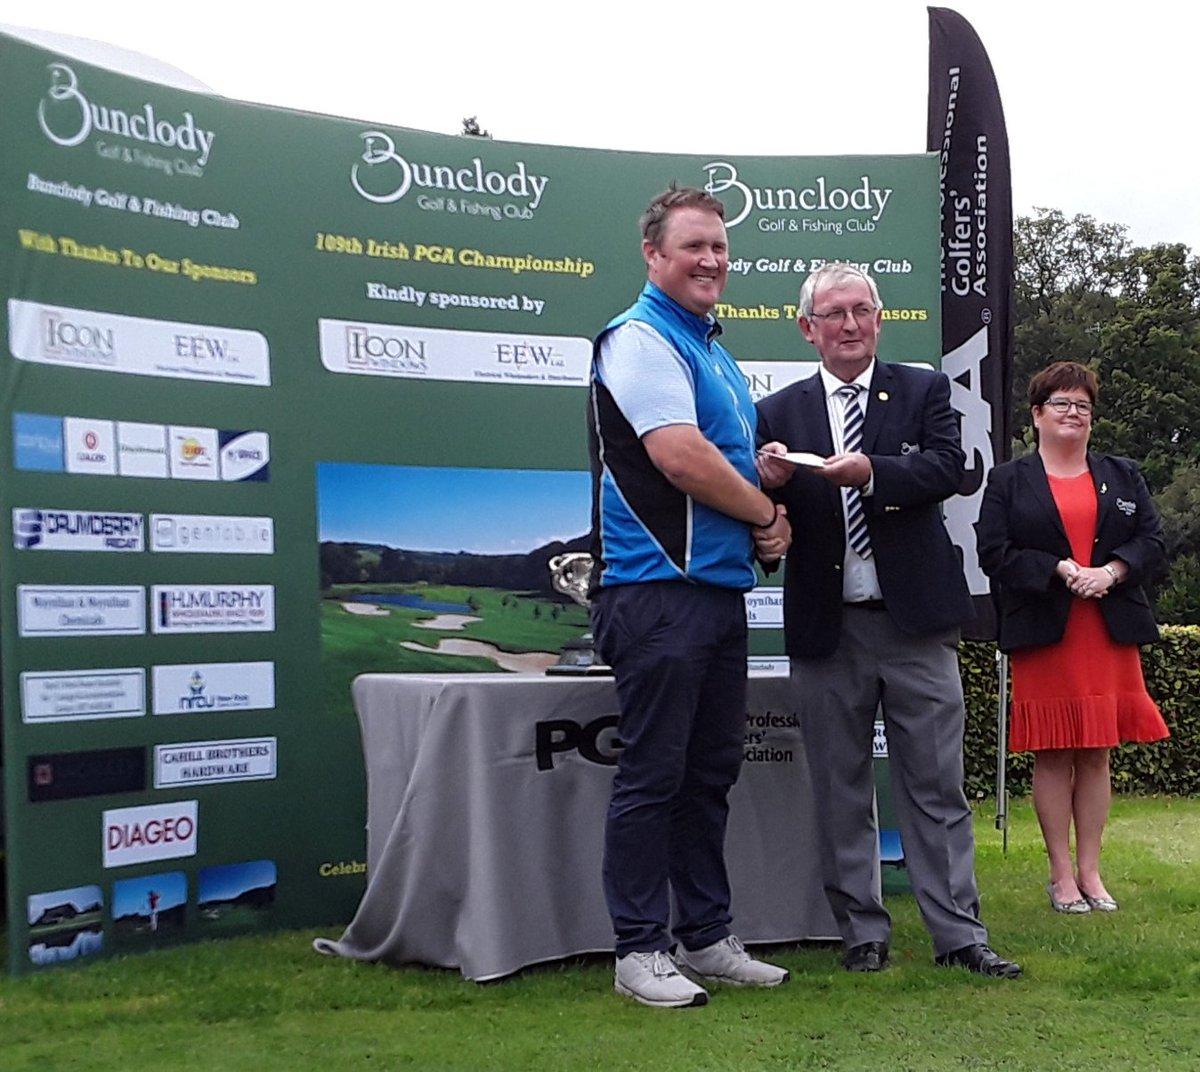 RT @PGA_Ireland: Second for @Michael_McGeady 109th Irish PGA Championship  on -6 #golf https://t.co/0AIWPMe1vM